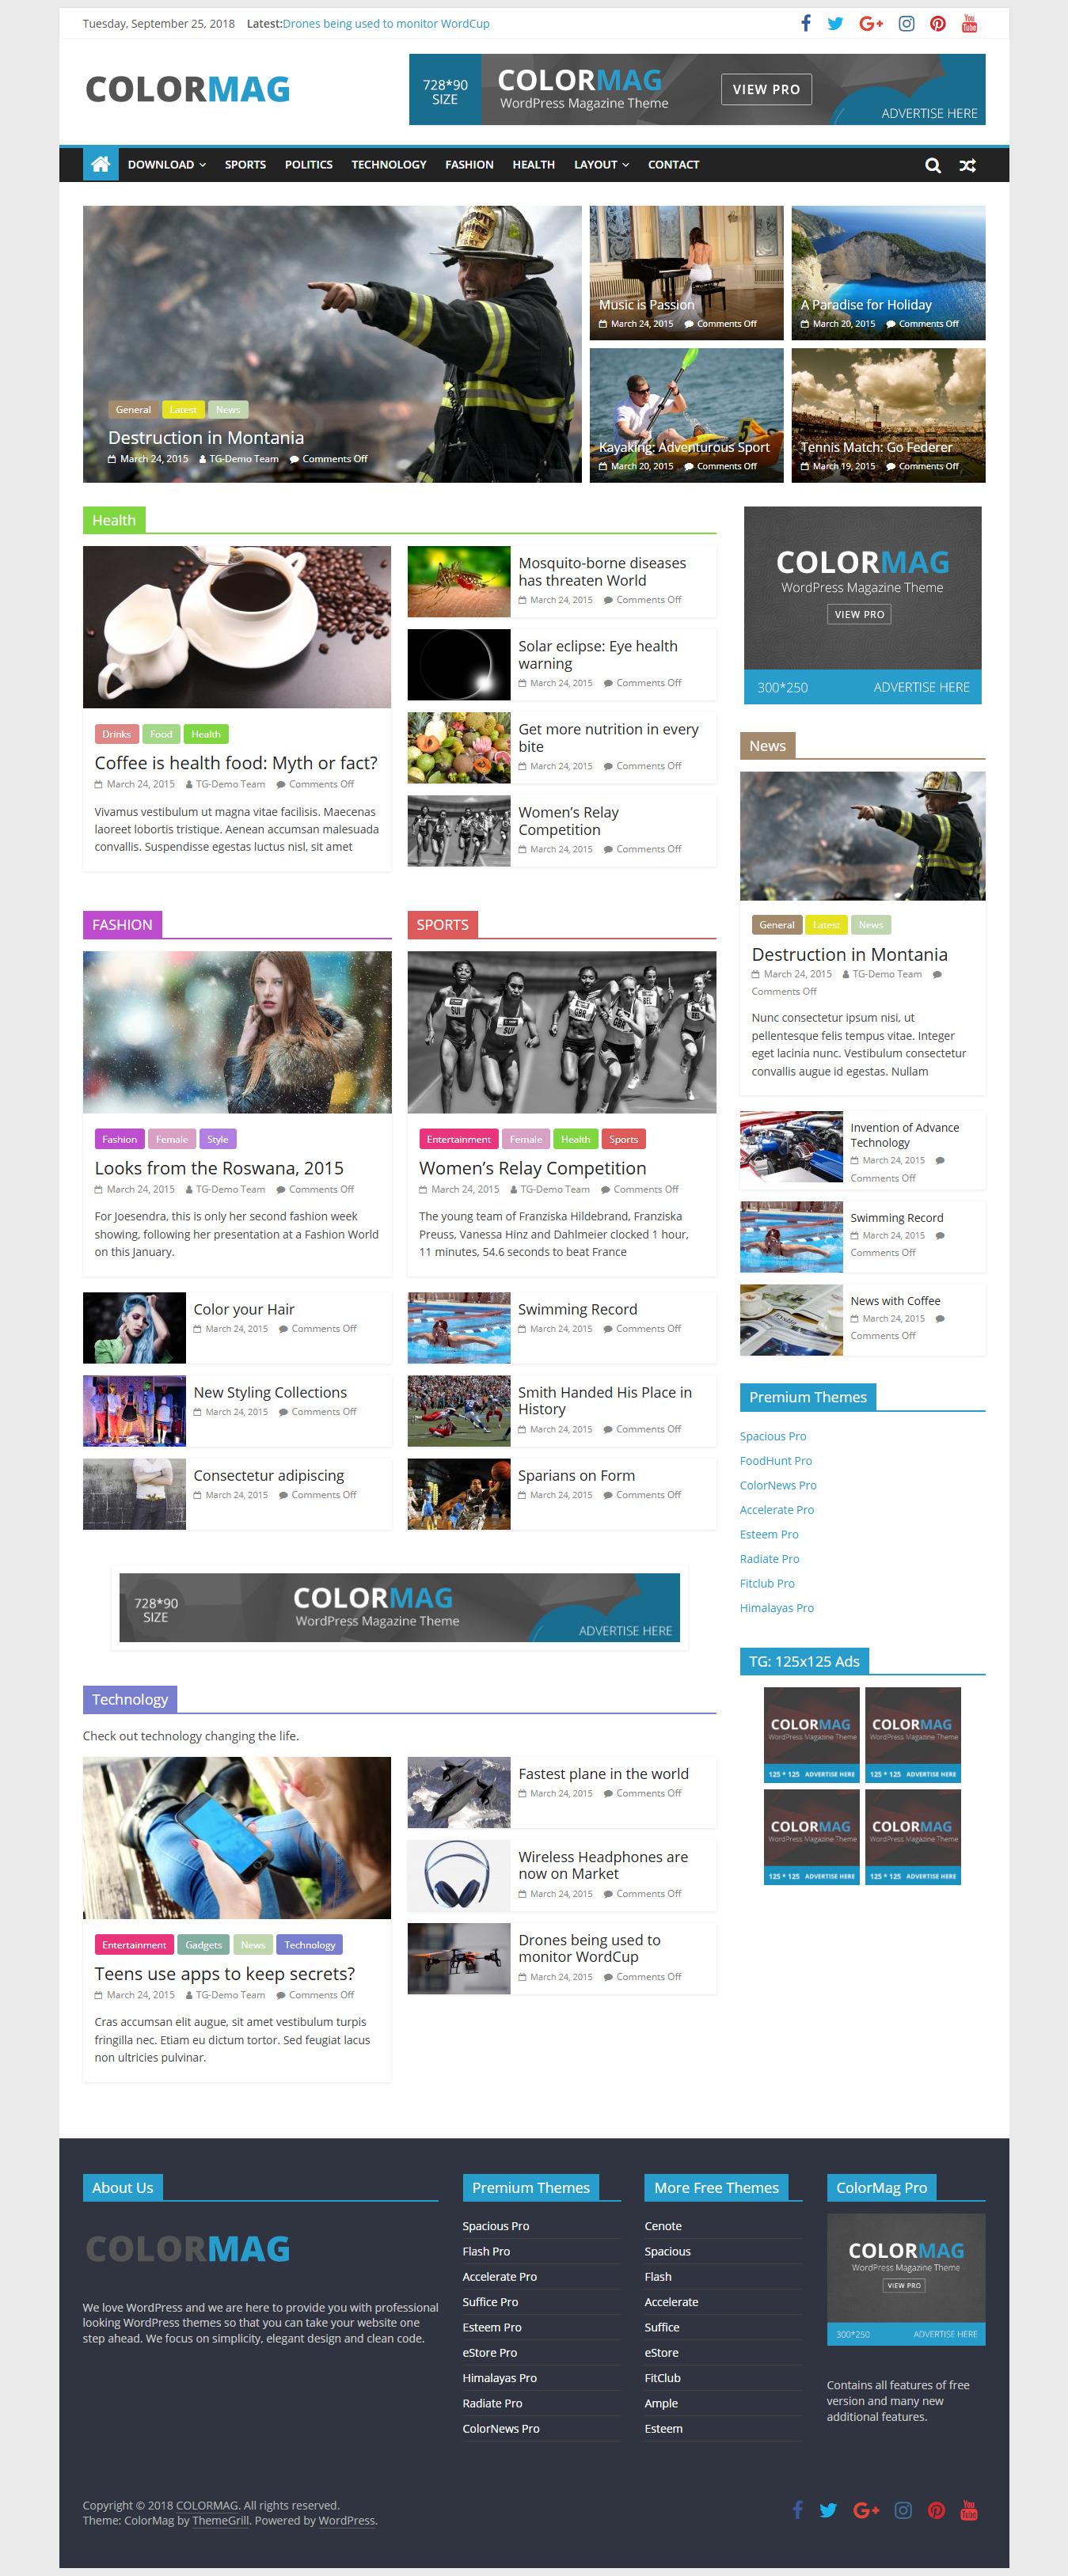 ColorMag - Best Premium Adsense Optimized WordPress Theme